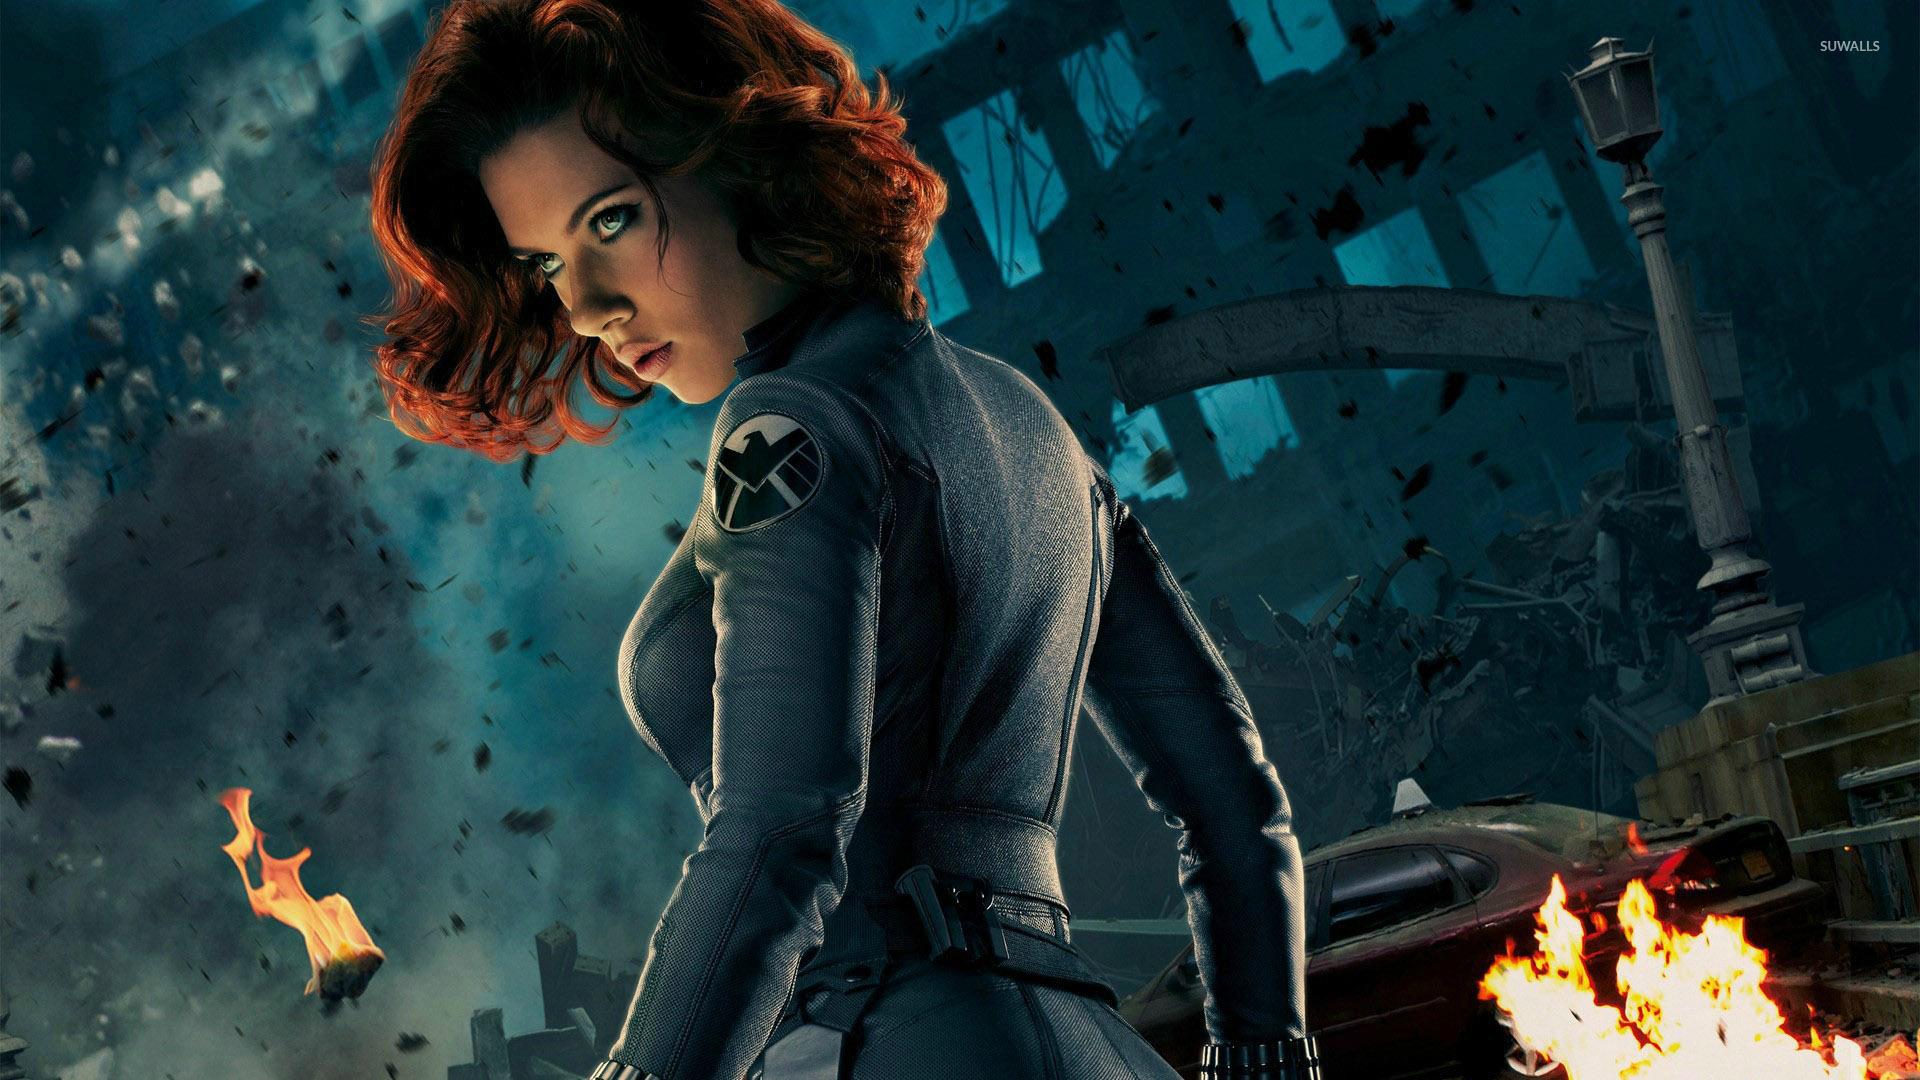 Black Widow - The Avengers [3] wallpaper - Movie wallpapers